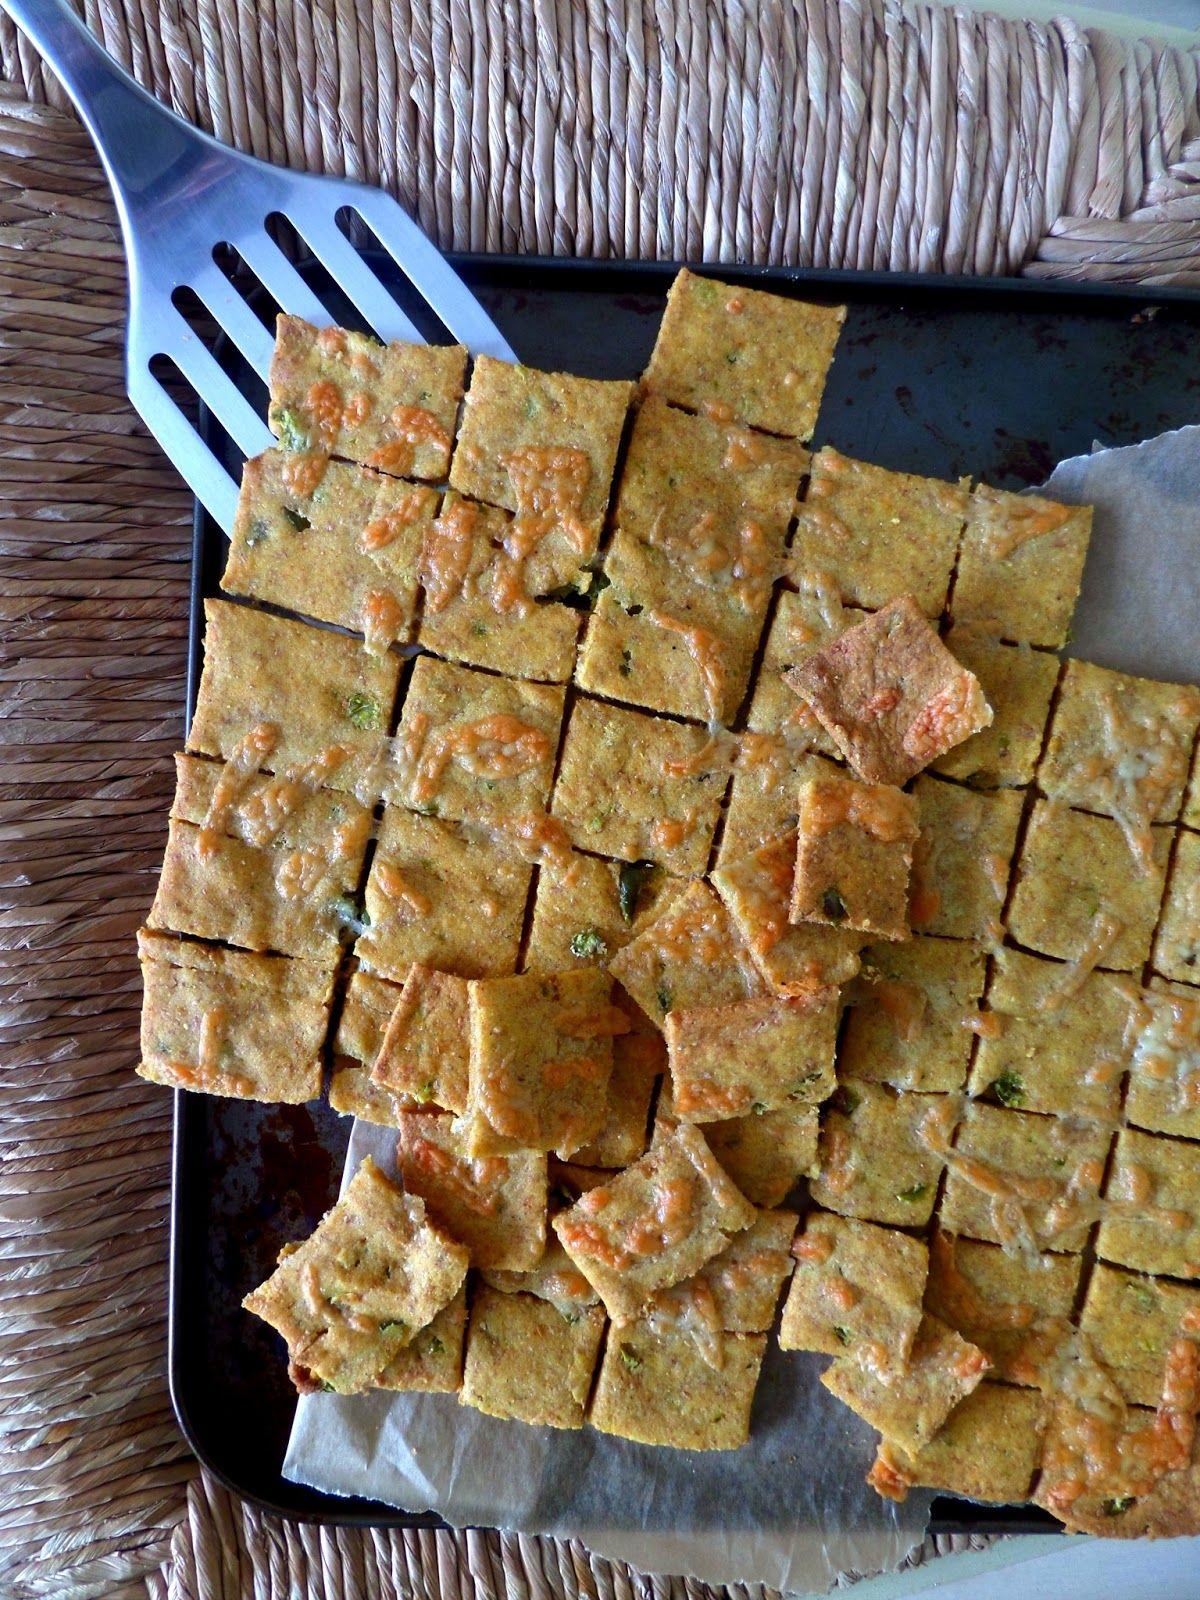 Jalapeno cheddar polenta crackers // Crackers a la polenta, piment jalapeno et cheddar   My Nomad Cuisine